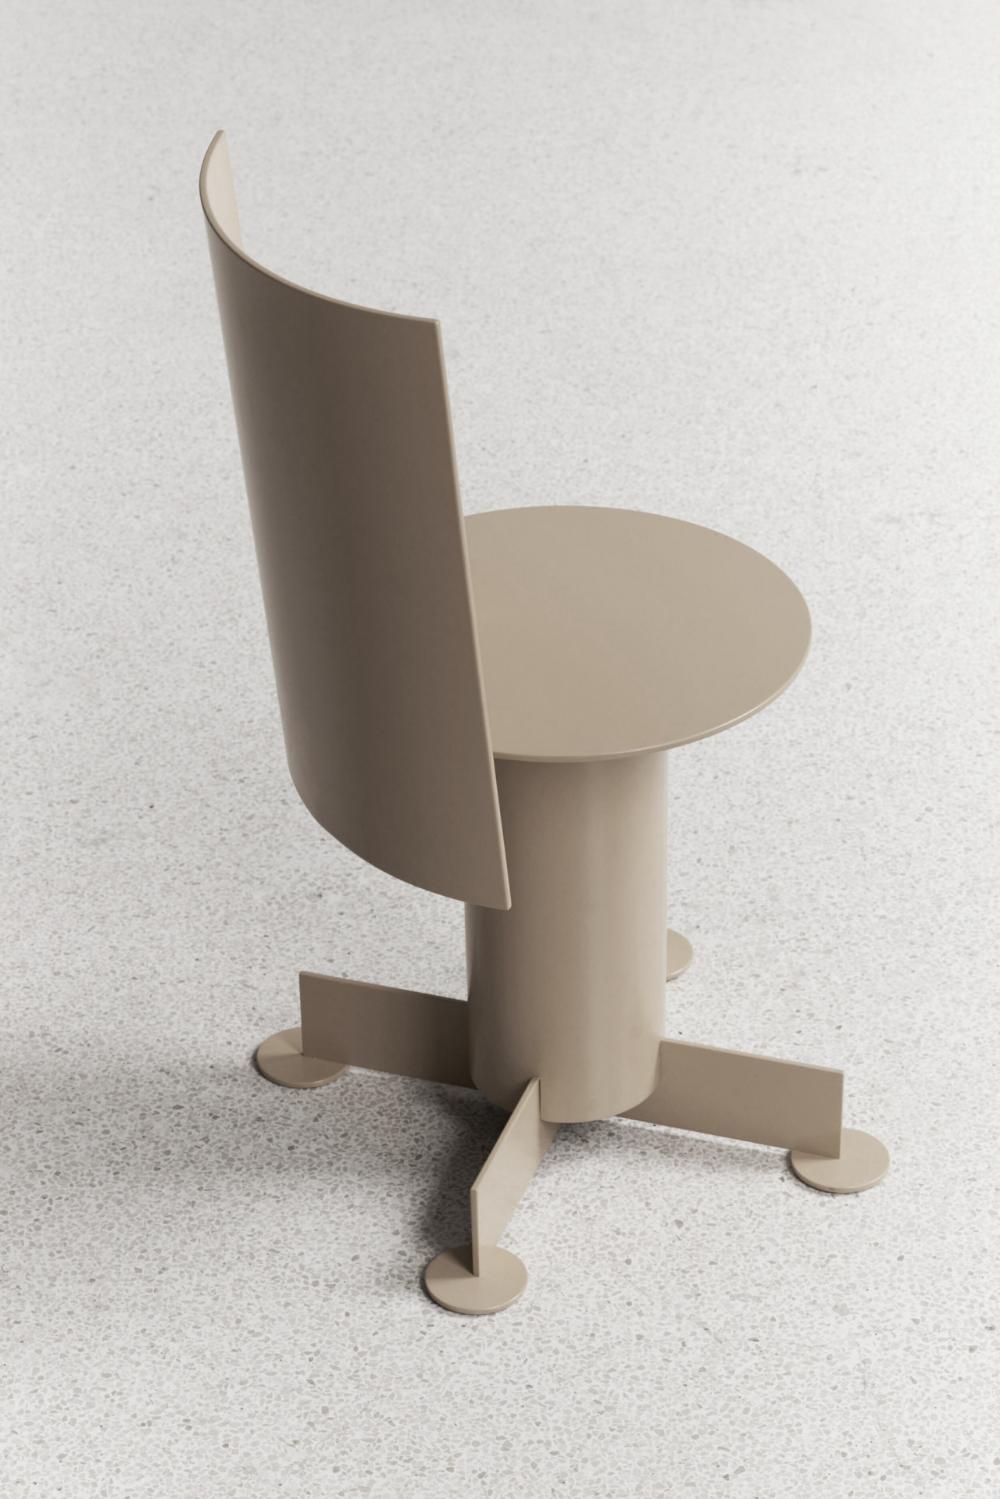 R2 Ca 2019 Minimal Chairs Furniture Design Furniture Chair